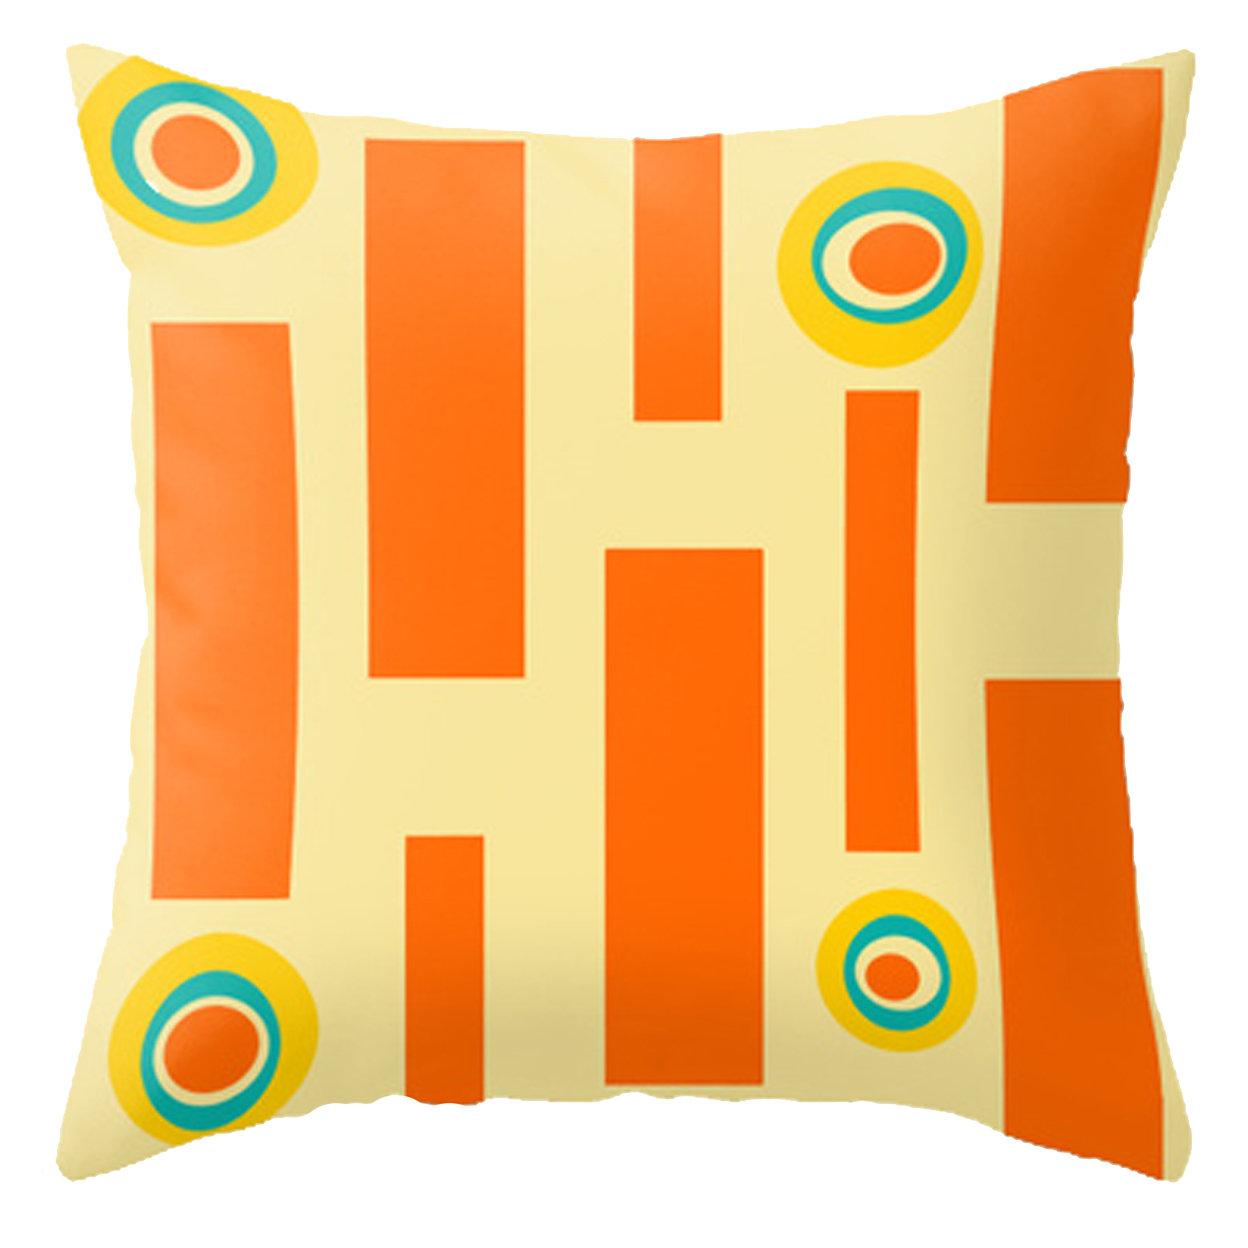 mid century modern pillows united states  crash pad designs  - modern outdoor pillow adler